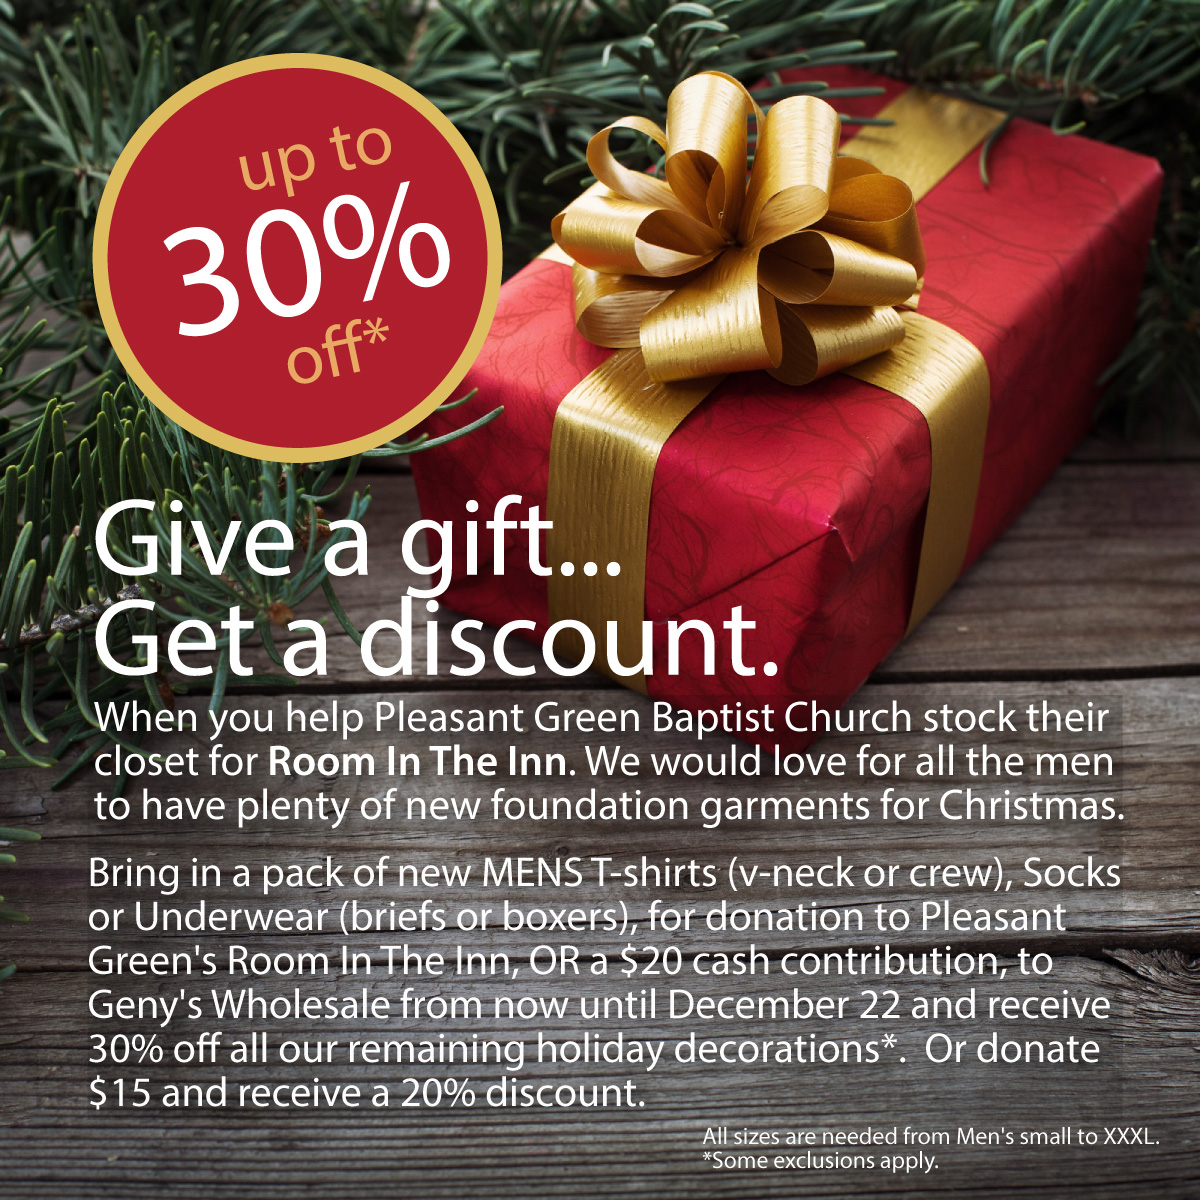 Genys Holiday Decor